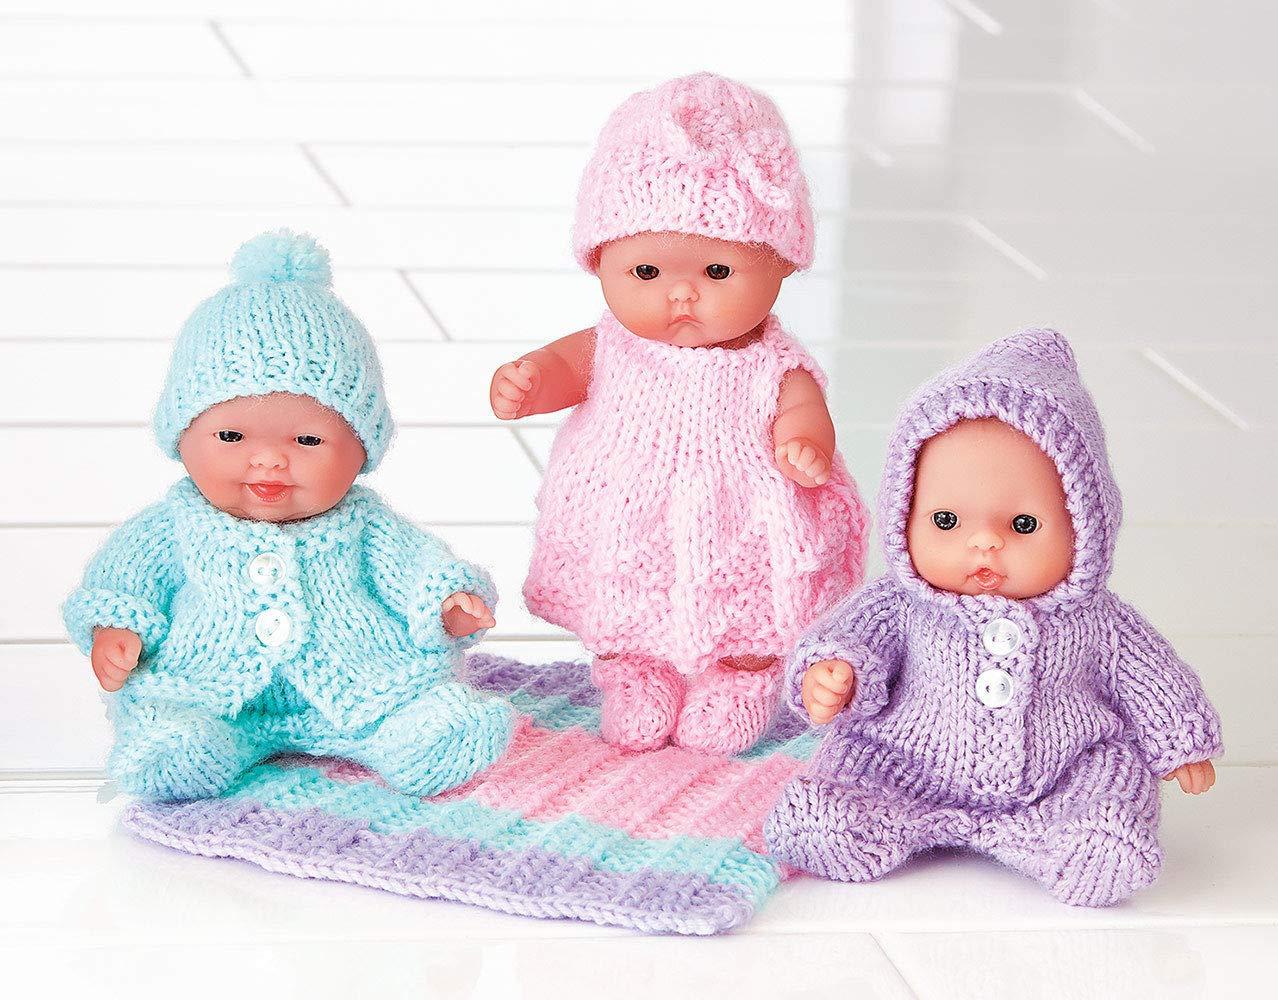 Tiny Trio of Outfits